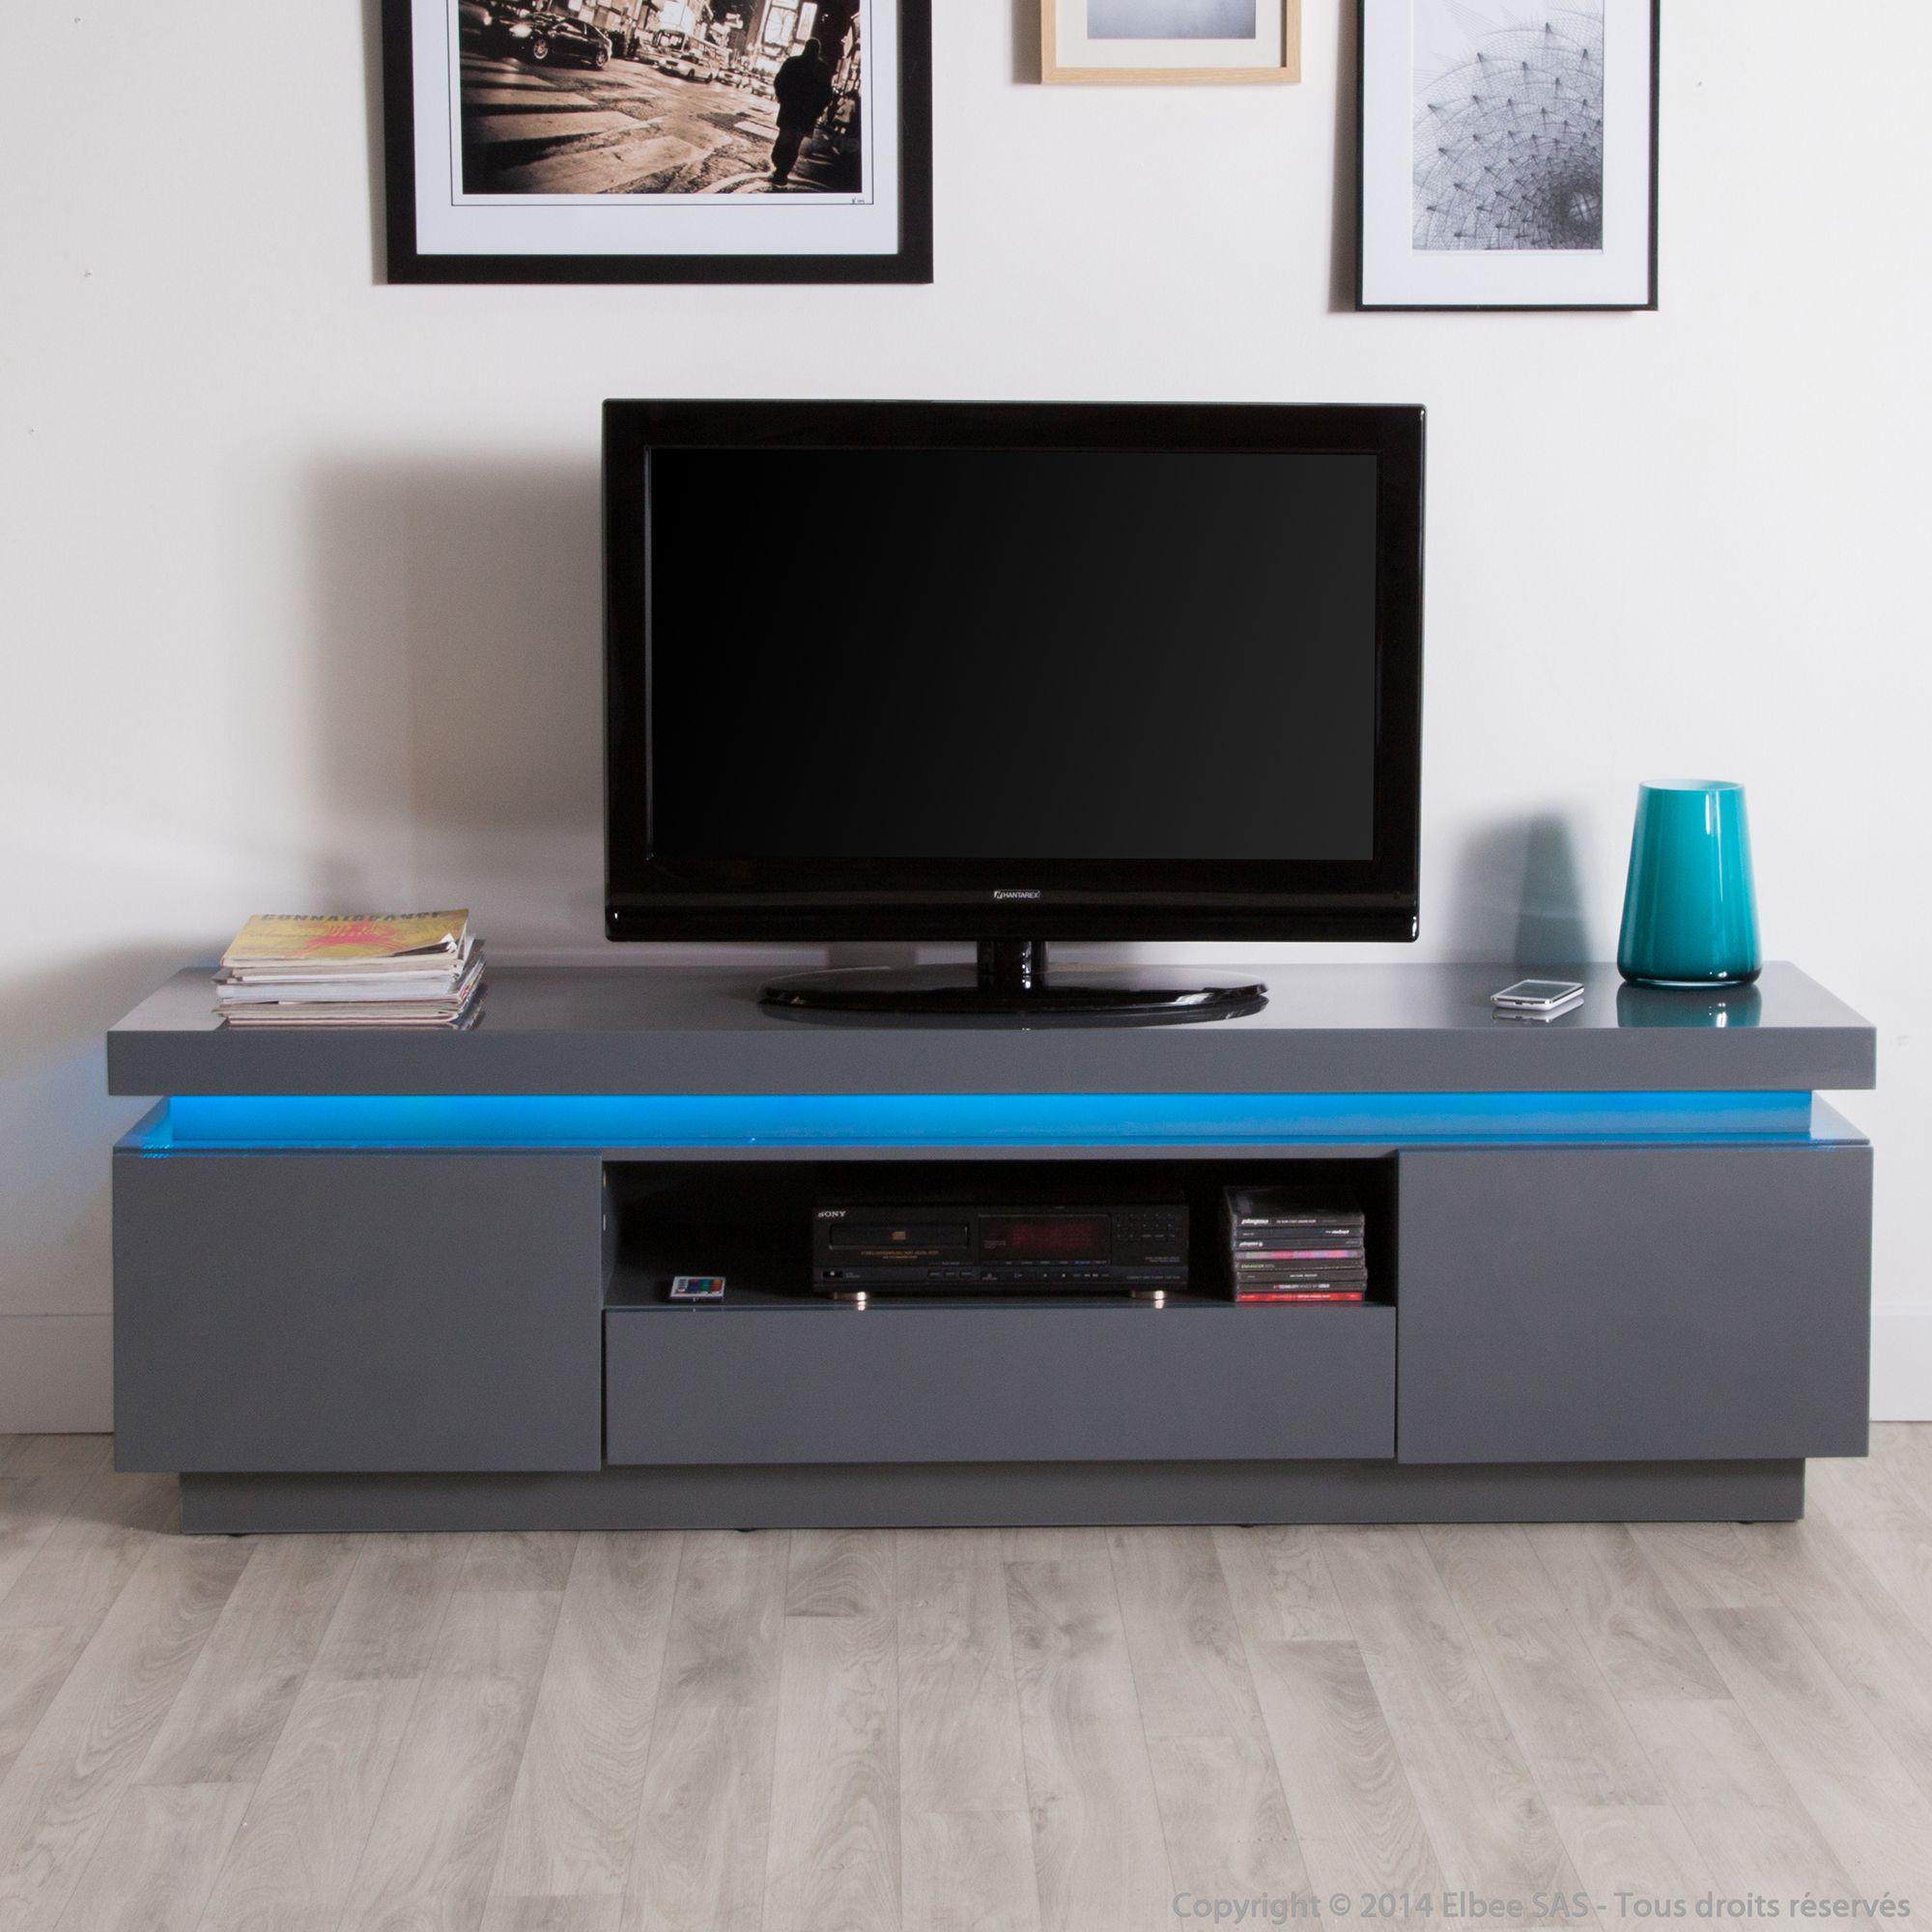 Design Un Meuble Tv Avec Leds Ivy De Axe Design Affordable Decor Tv Cabinets Home